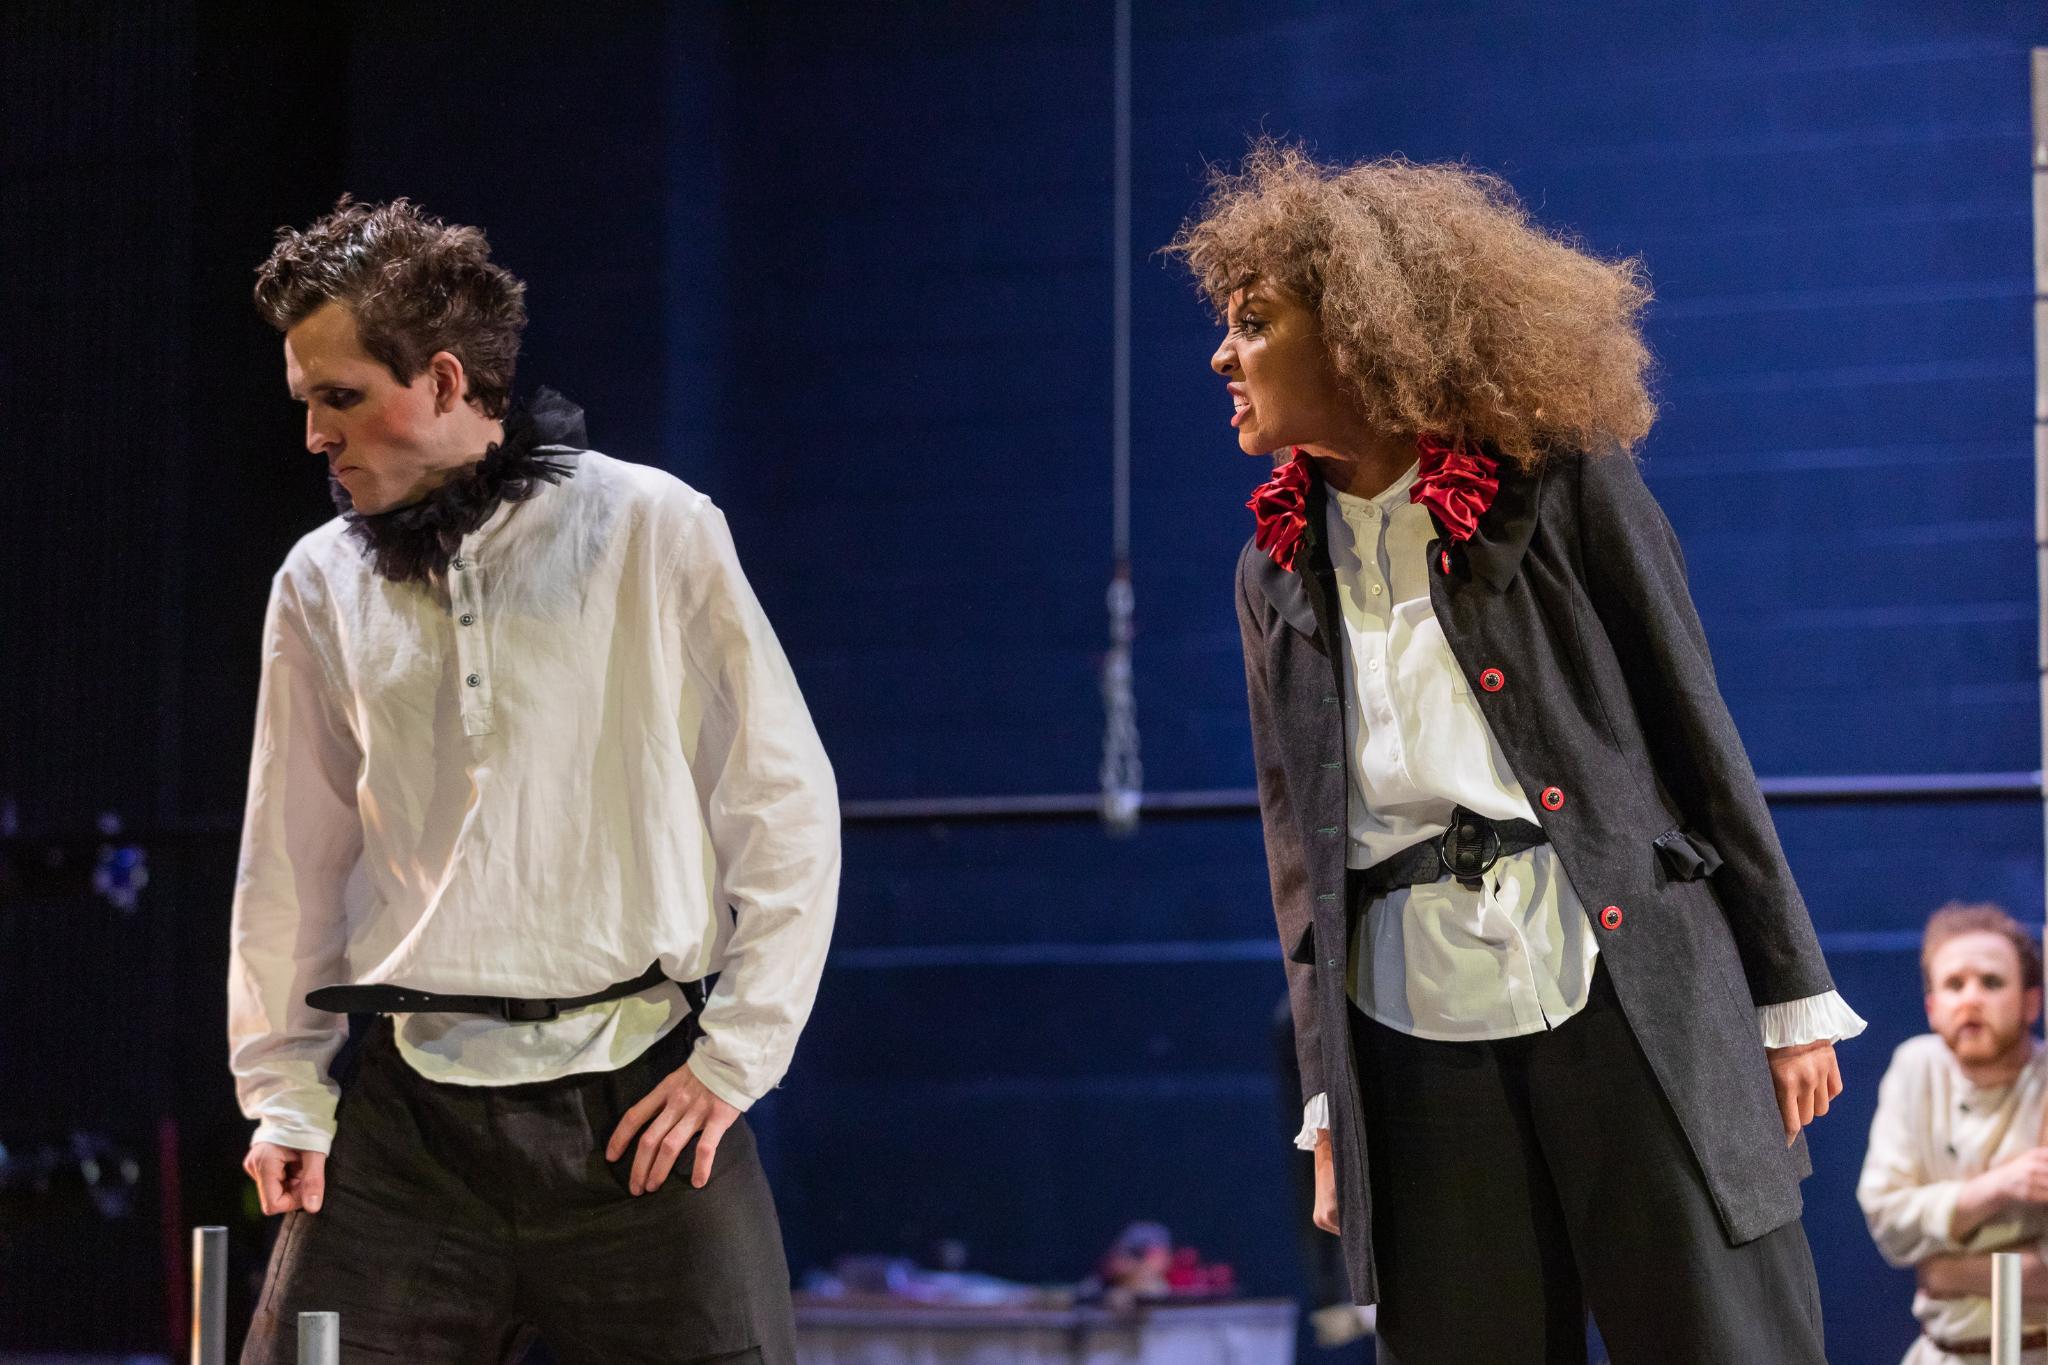 John Hardin (Mercutio) and Malikah McHarrin-Cobb (Prince Escalus) in Romeo & Juliet, CSC2, 2019-Photo by Nile Hawver